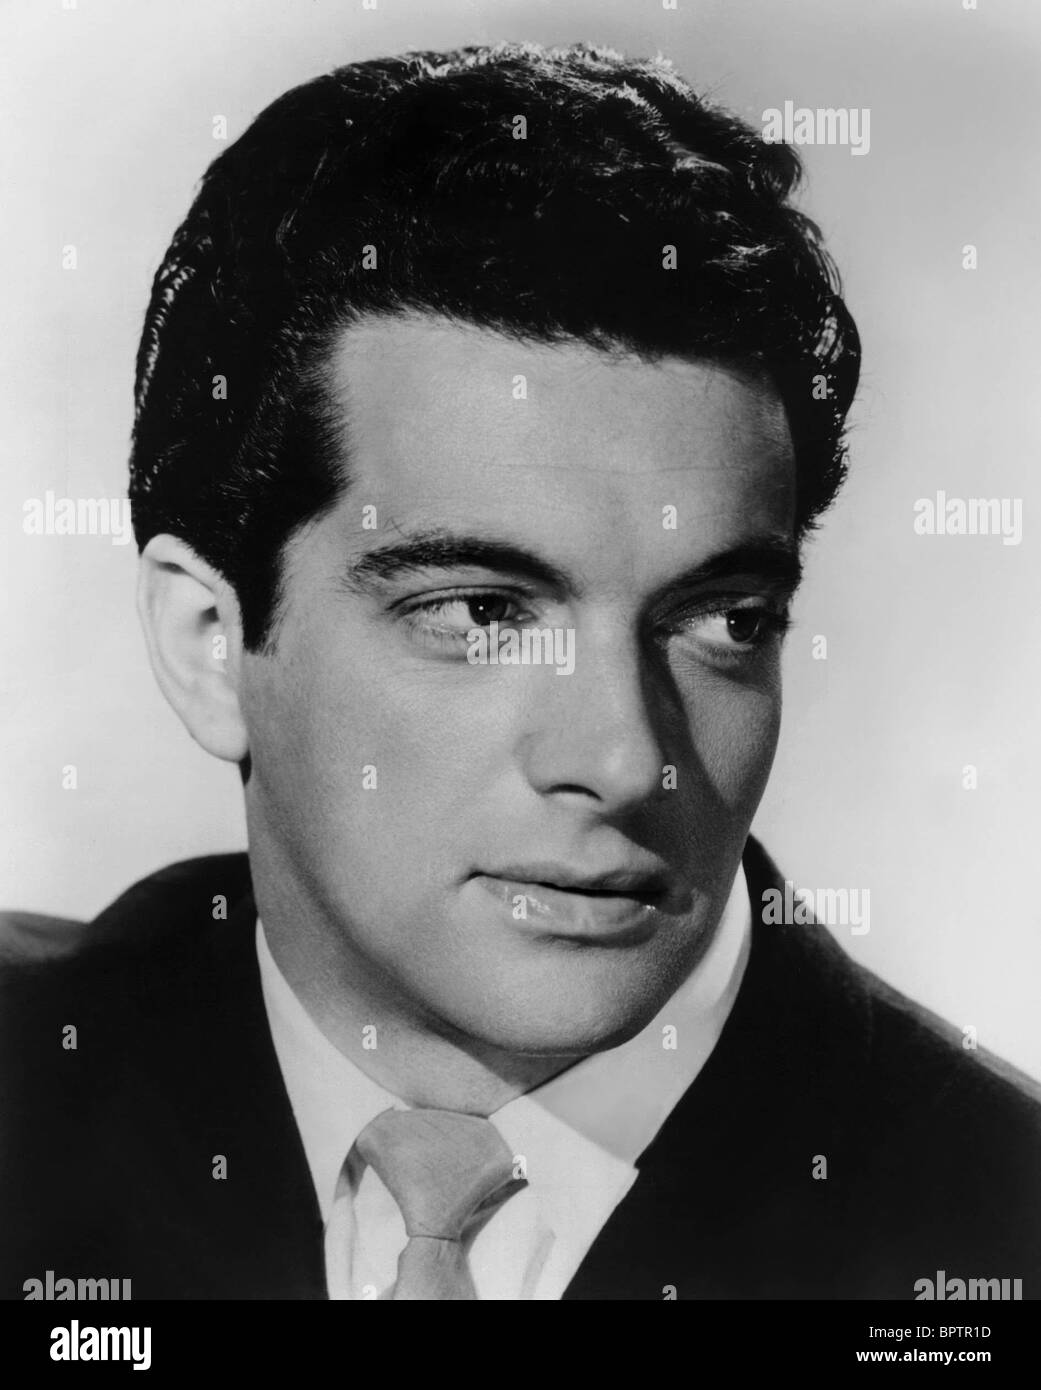 FRANKIE VAUGHN SINGER (1957) - Stock Image